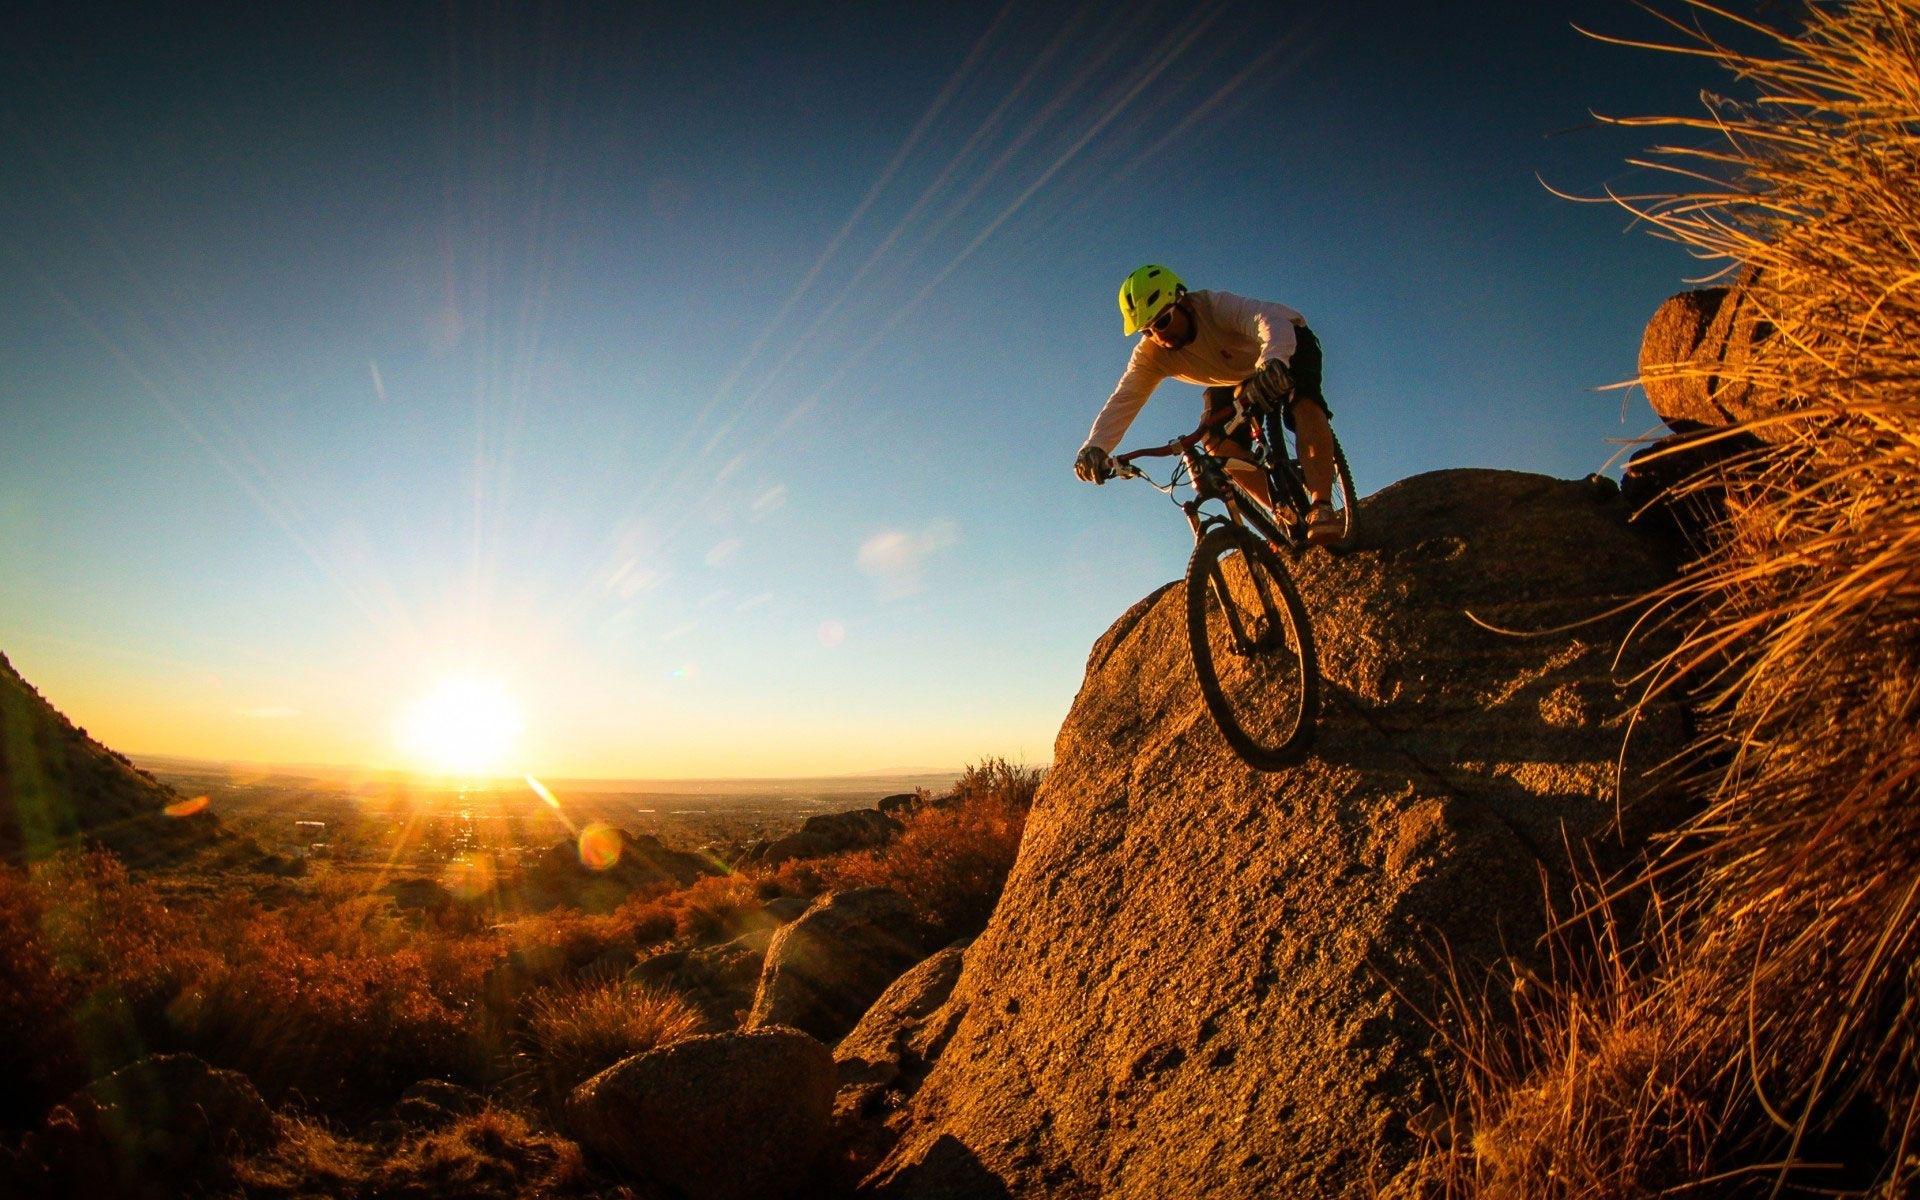 mountain biking – hd iphone wallpaper | mtb related | pinterest